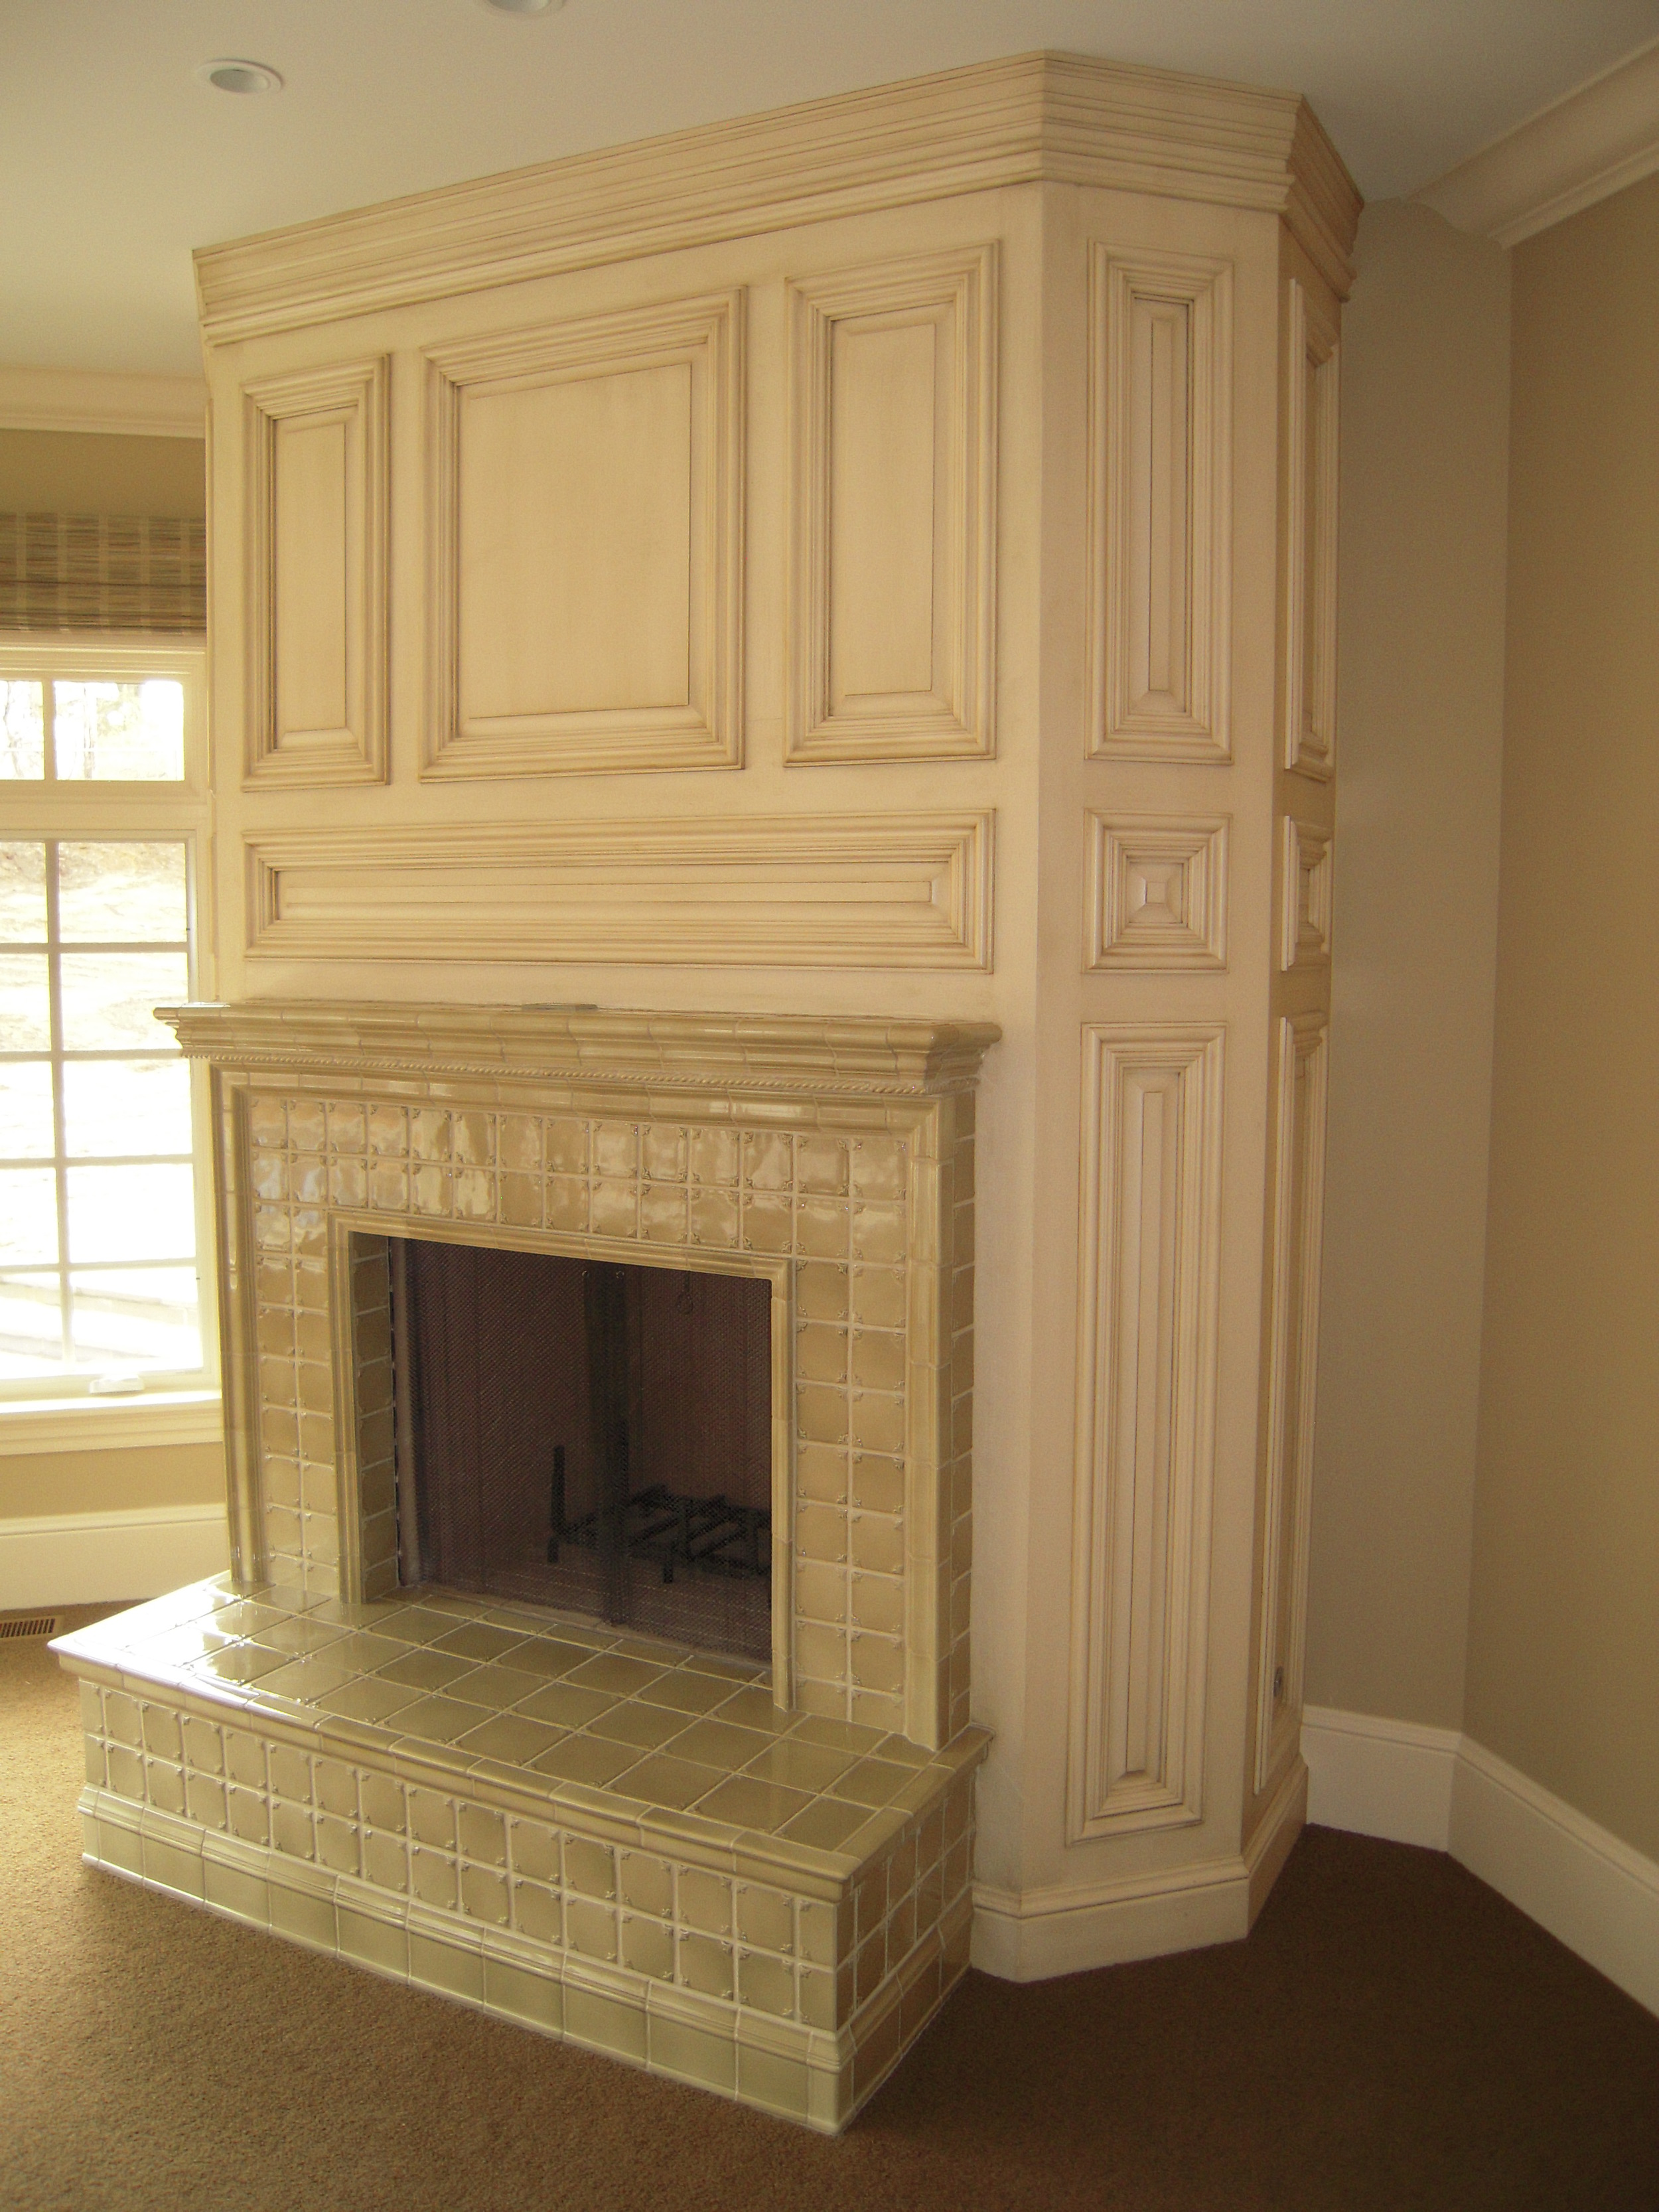 Mikan paneled fireplace surround.jpg